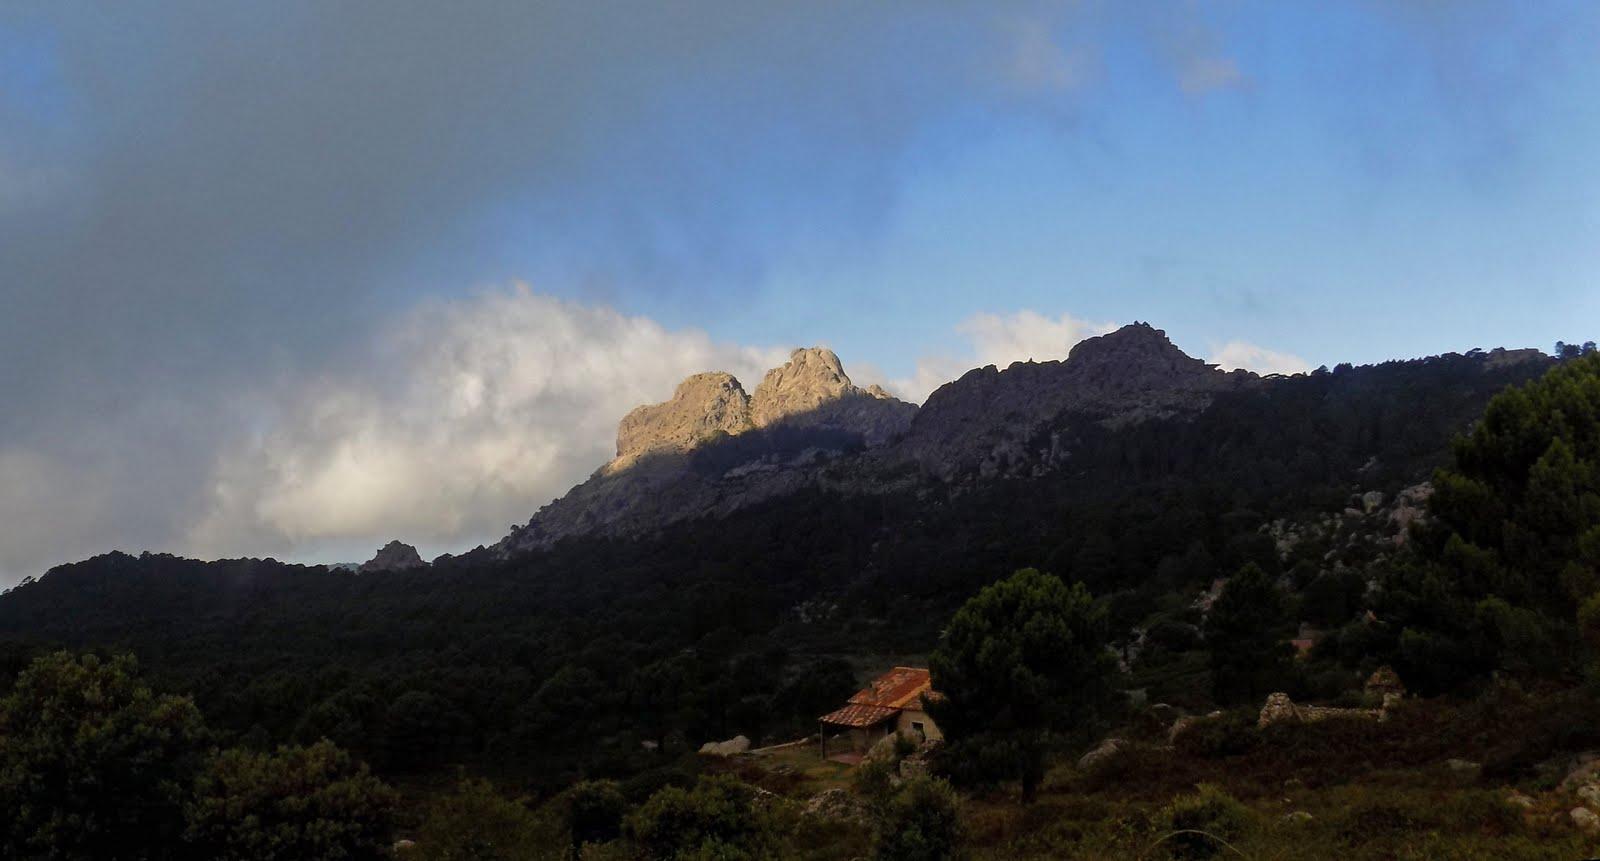 Capellu/Capellucciu depuis la crête de Bitalza (photo Olivier Hespel)